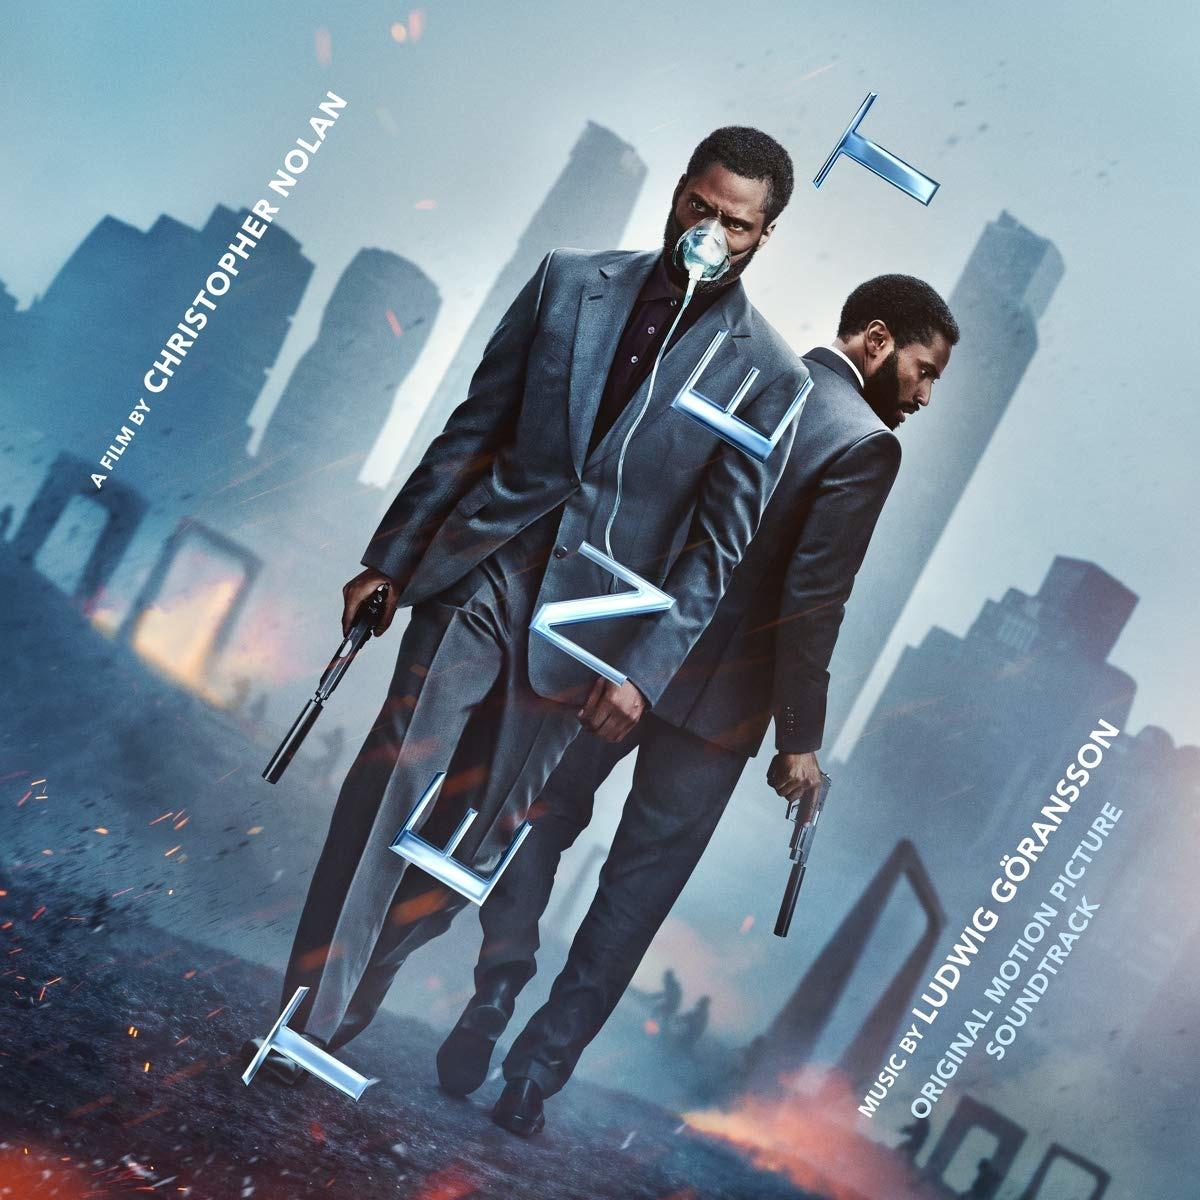 Tenet (Original Motion Picture Soundtrack) - Ludwig Göransson - Musik - Watertower Music - 0794043204258 - November 27, 2020